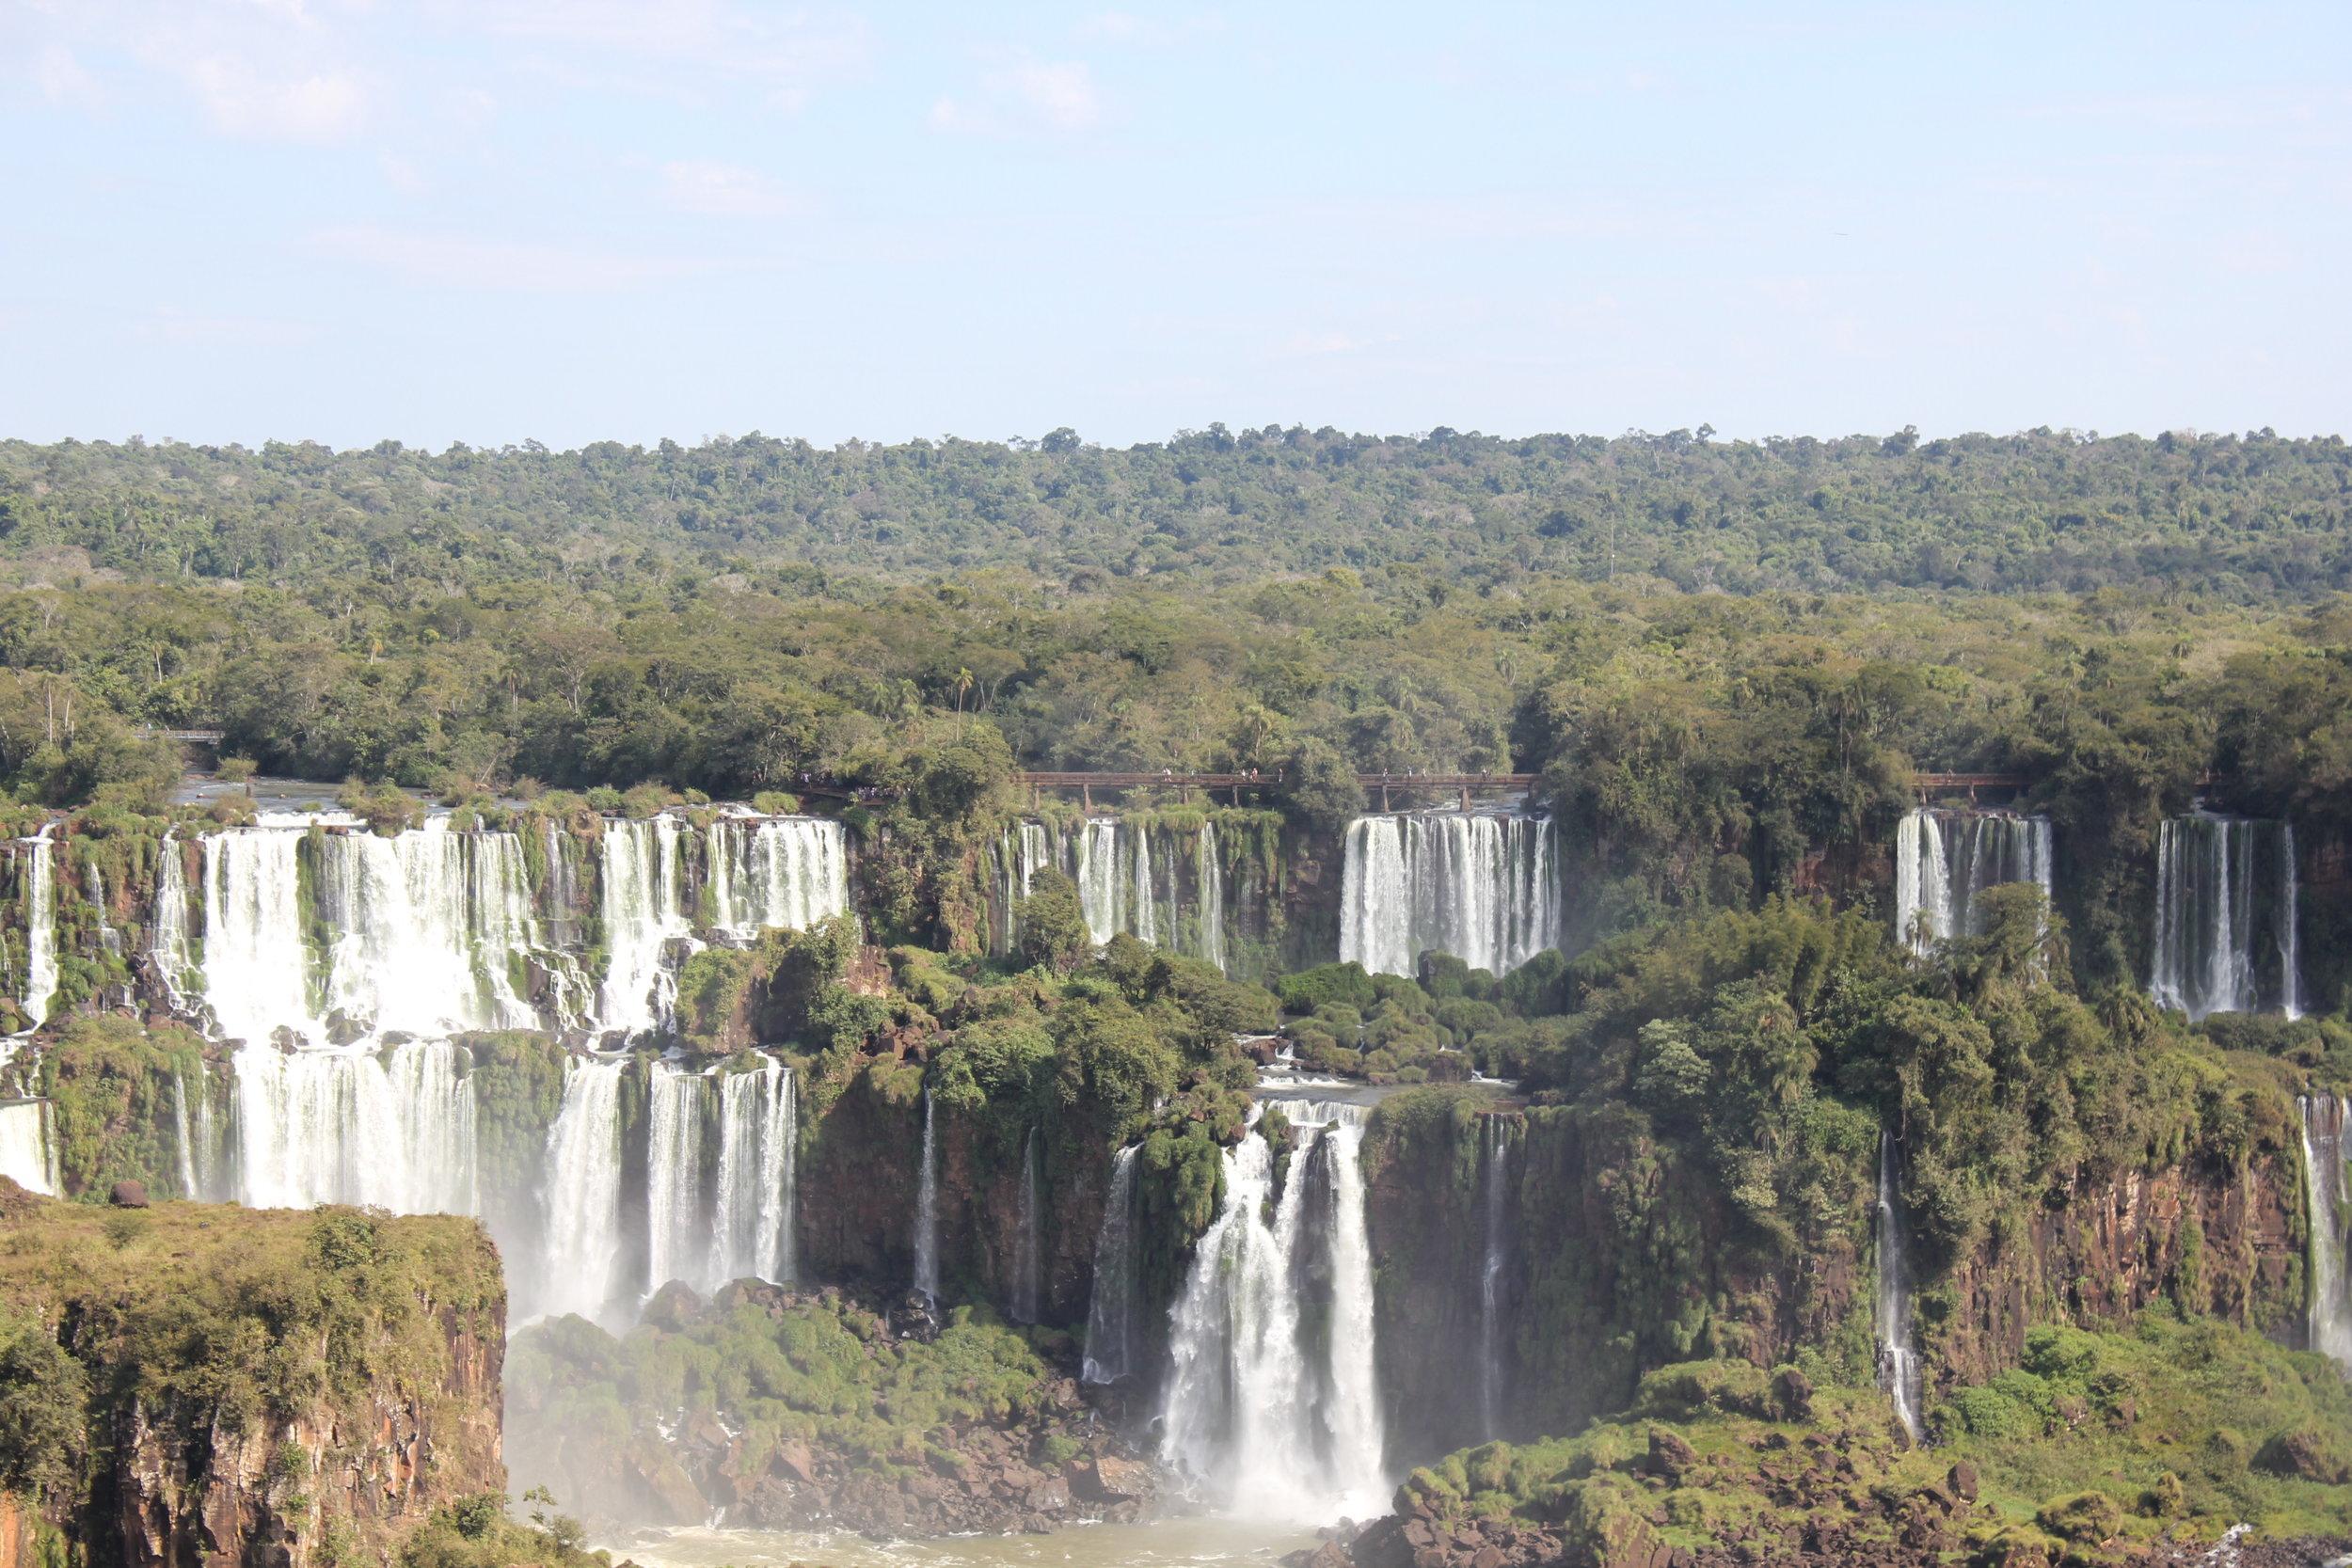 Iguazu Falls – View from the Brazil side